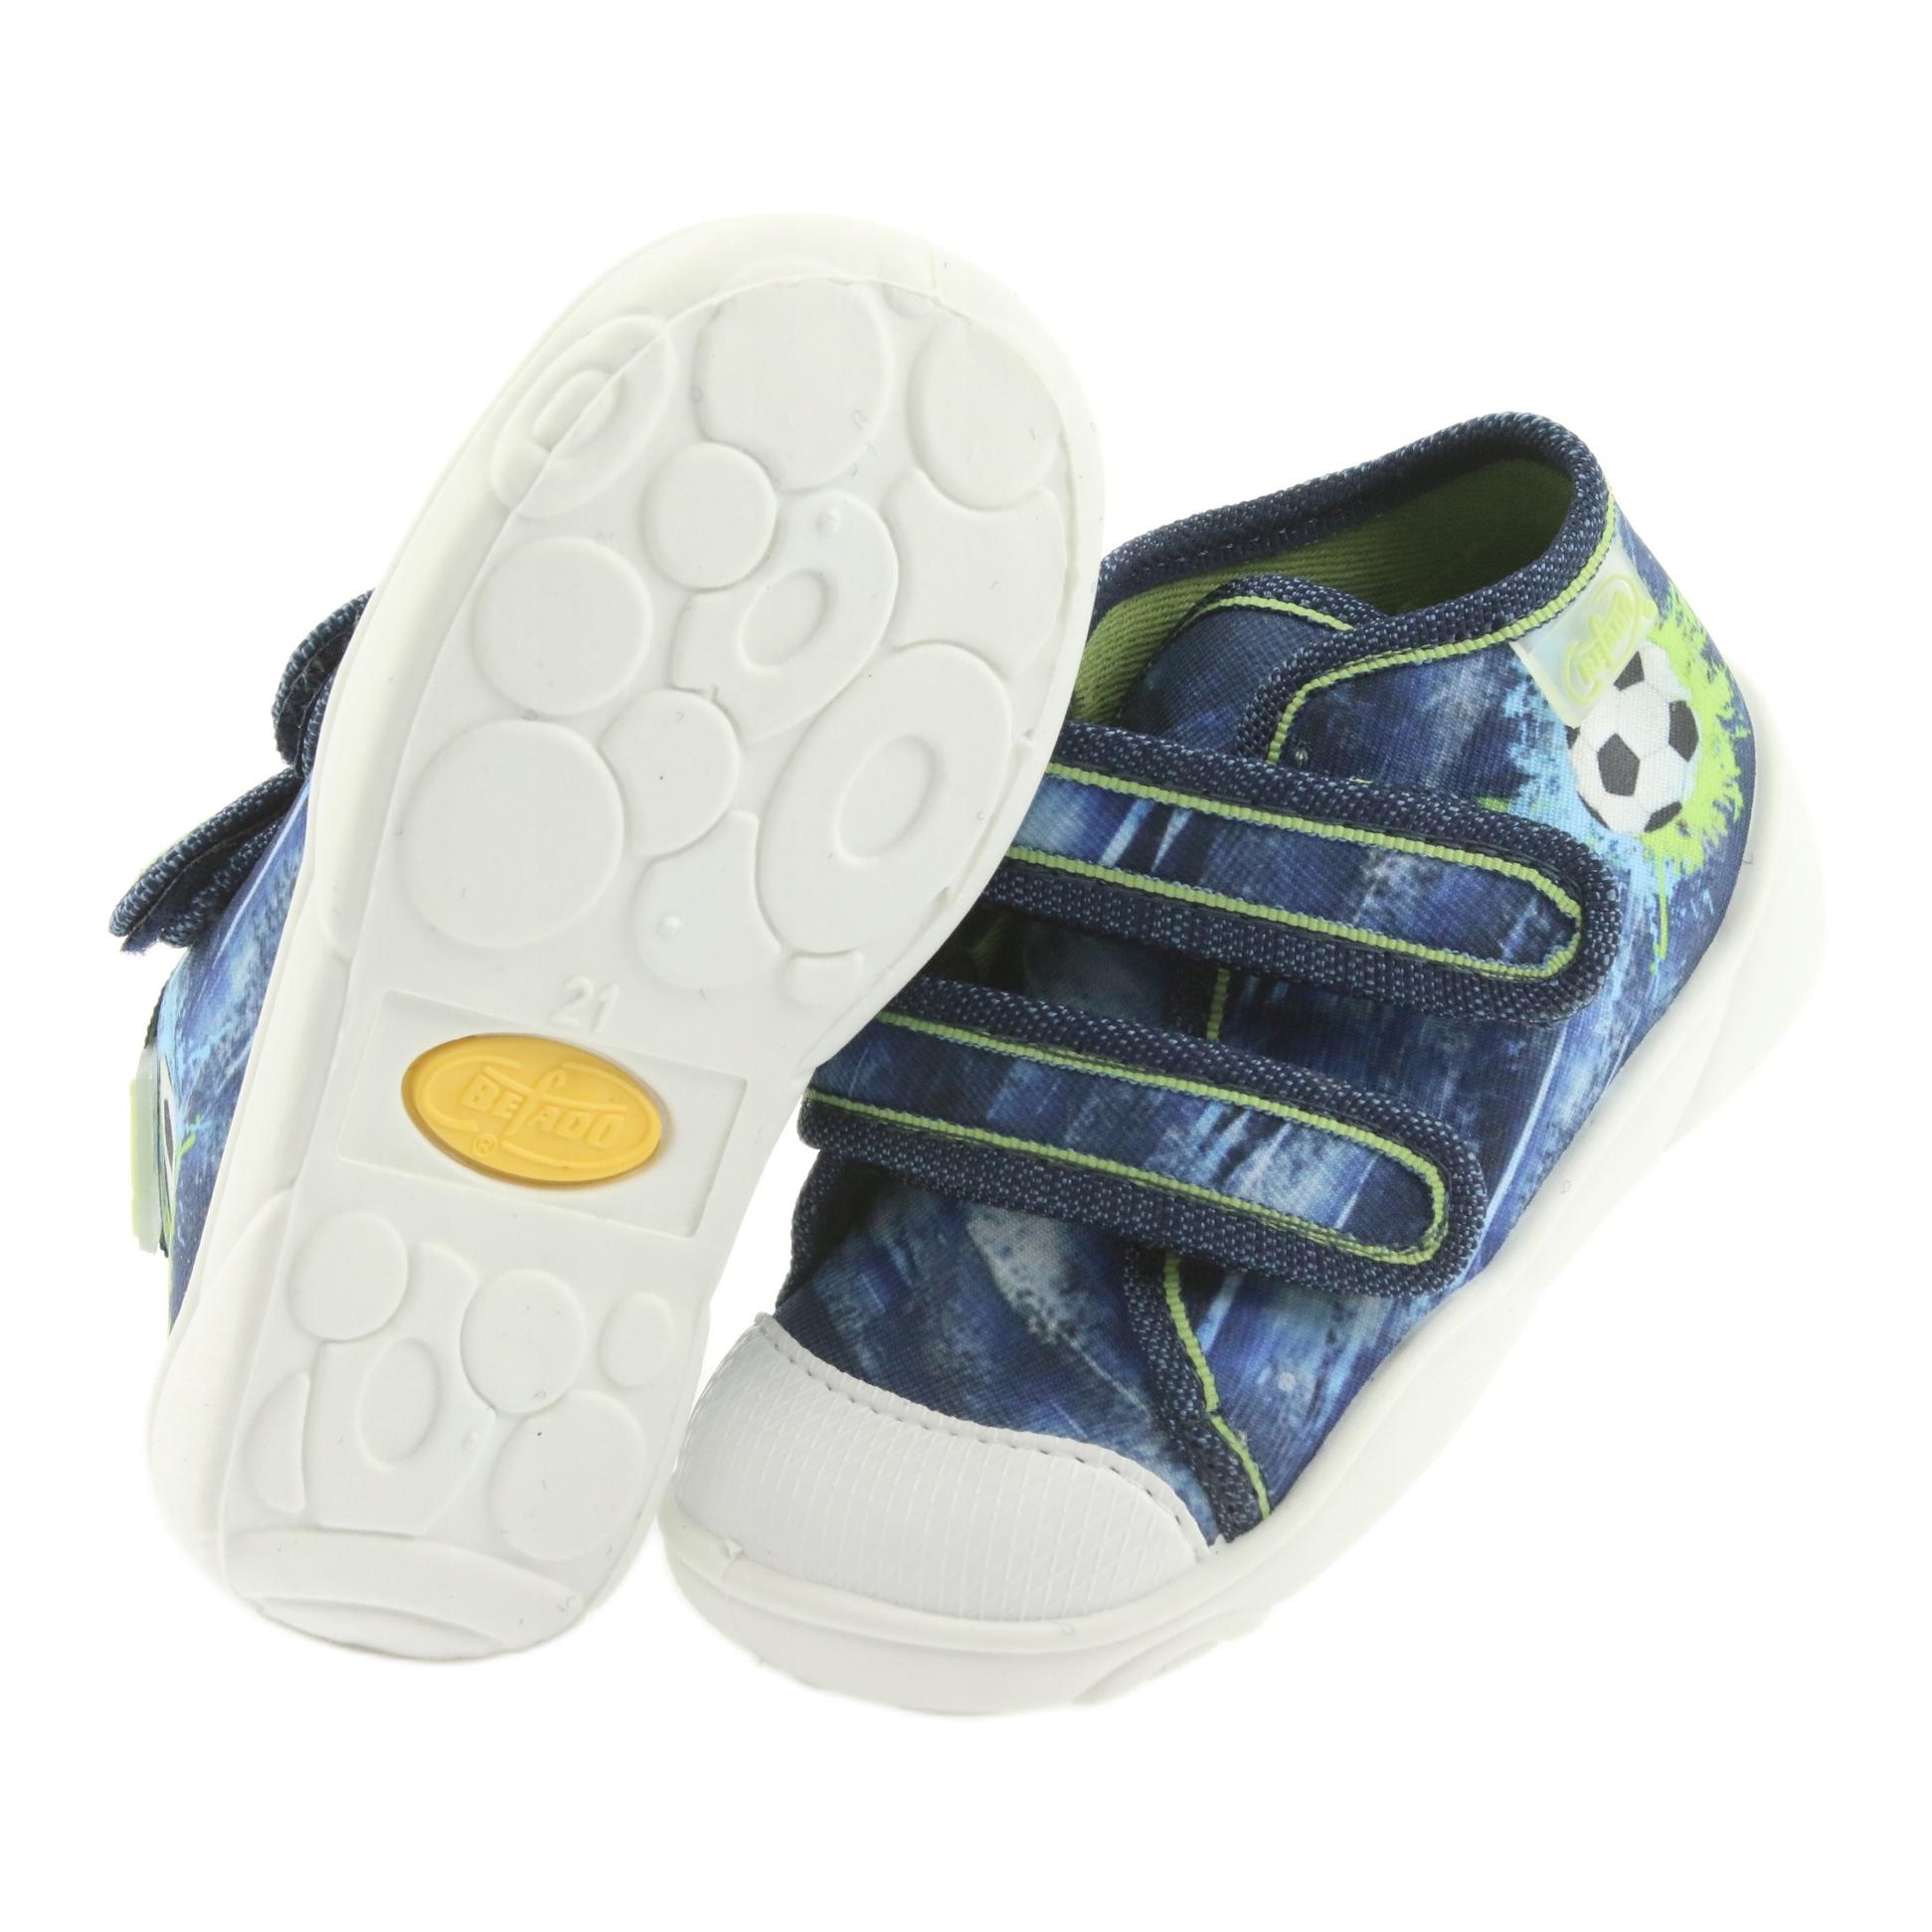 miniatura 6 - Scarpe da calcio per bambini Befado 212P058 blu verde marina